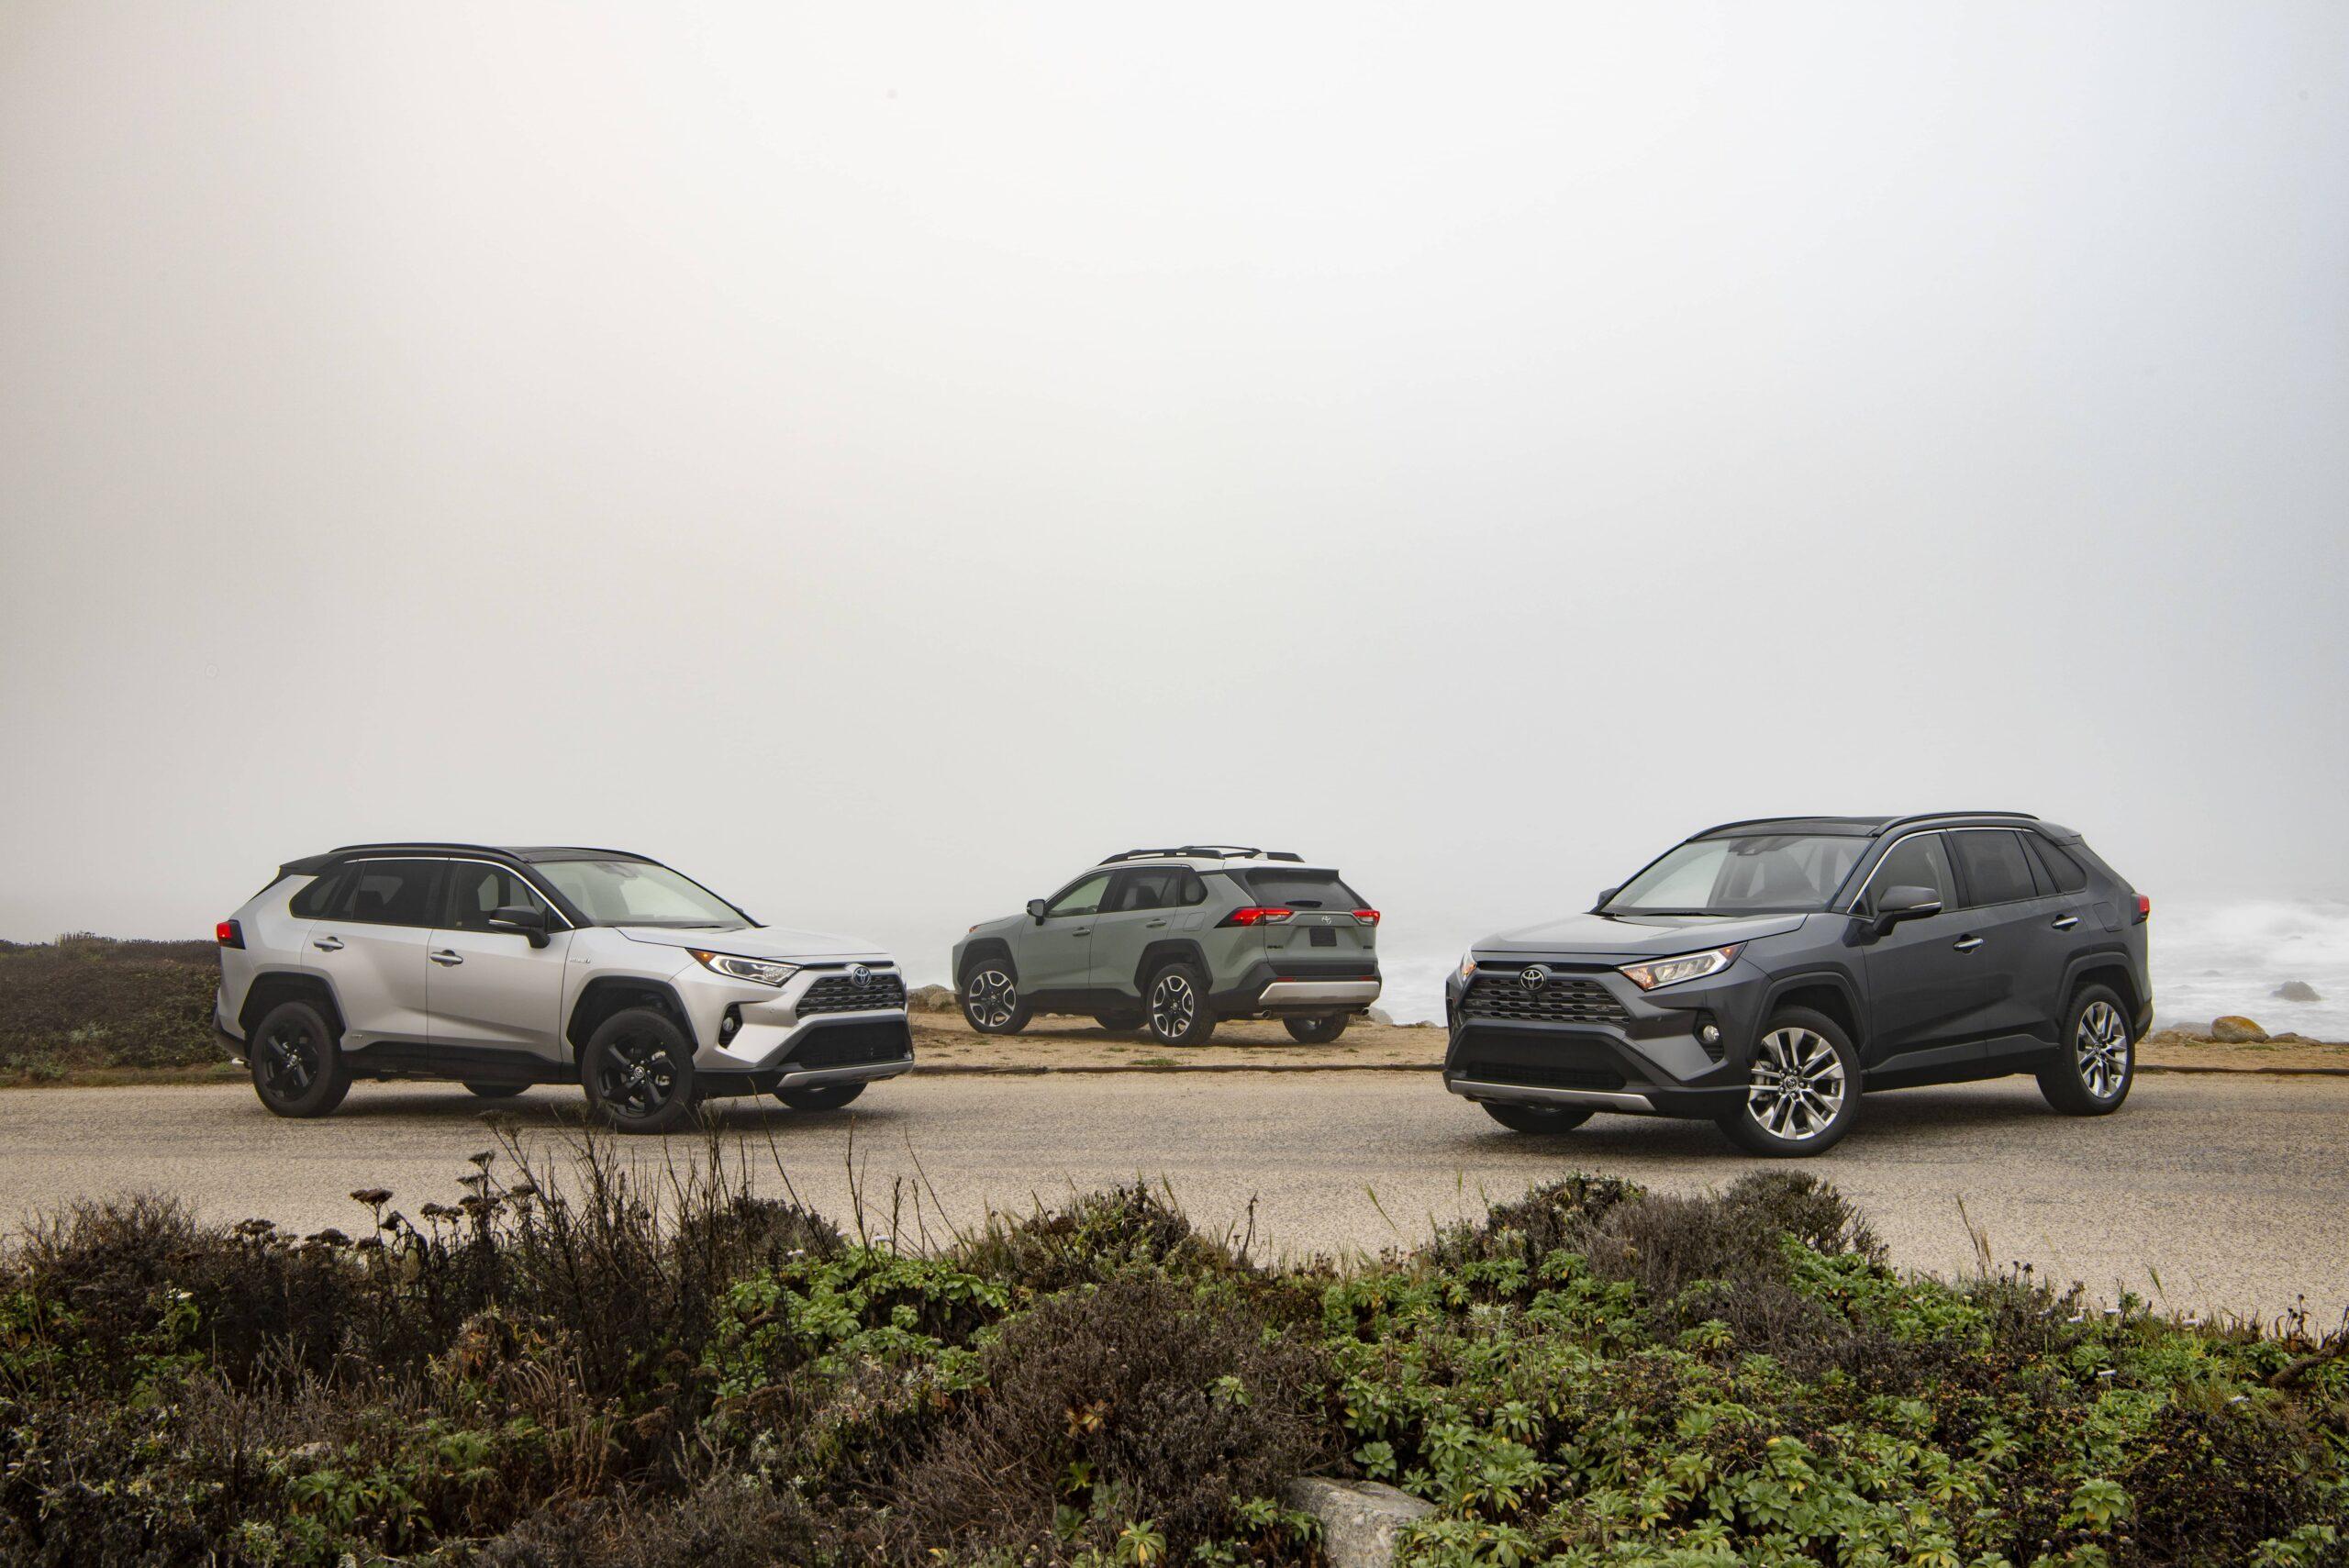 Groupe de Toyota RAV4 2020